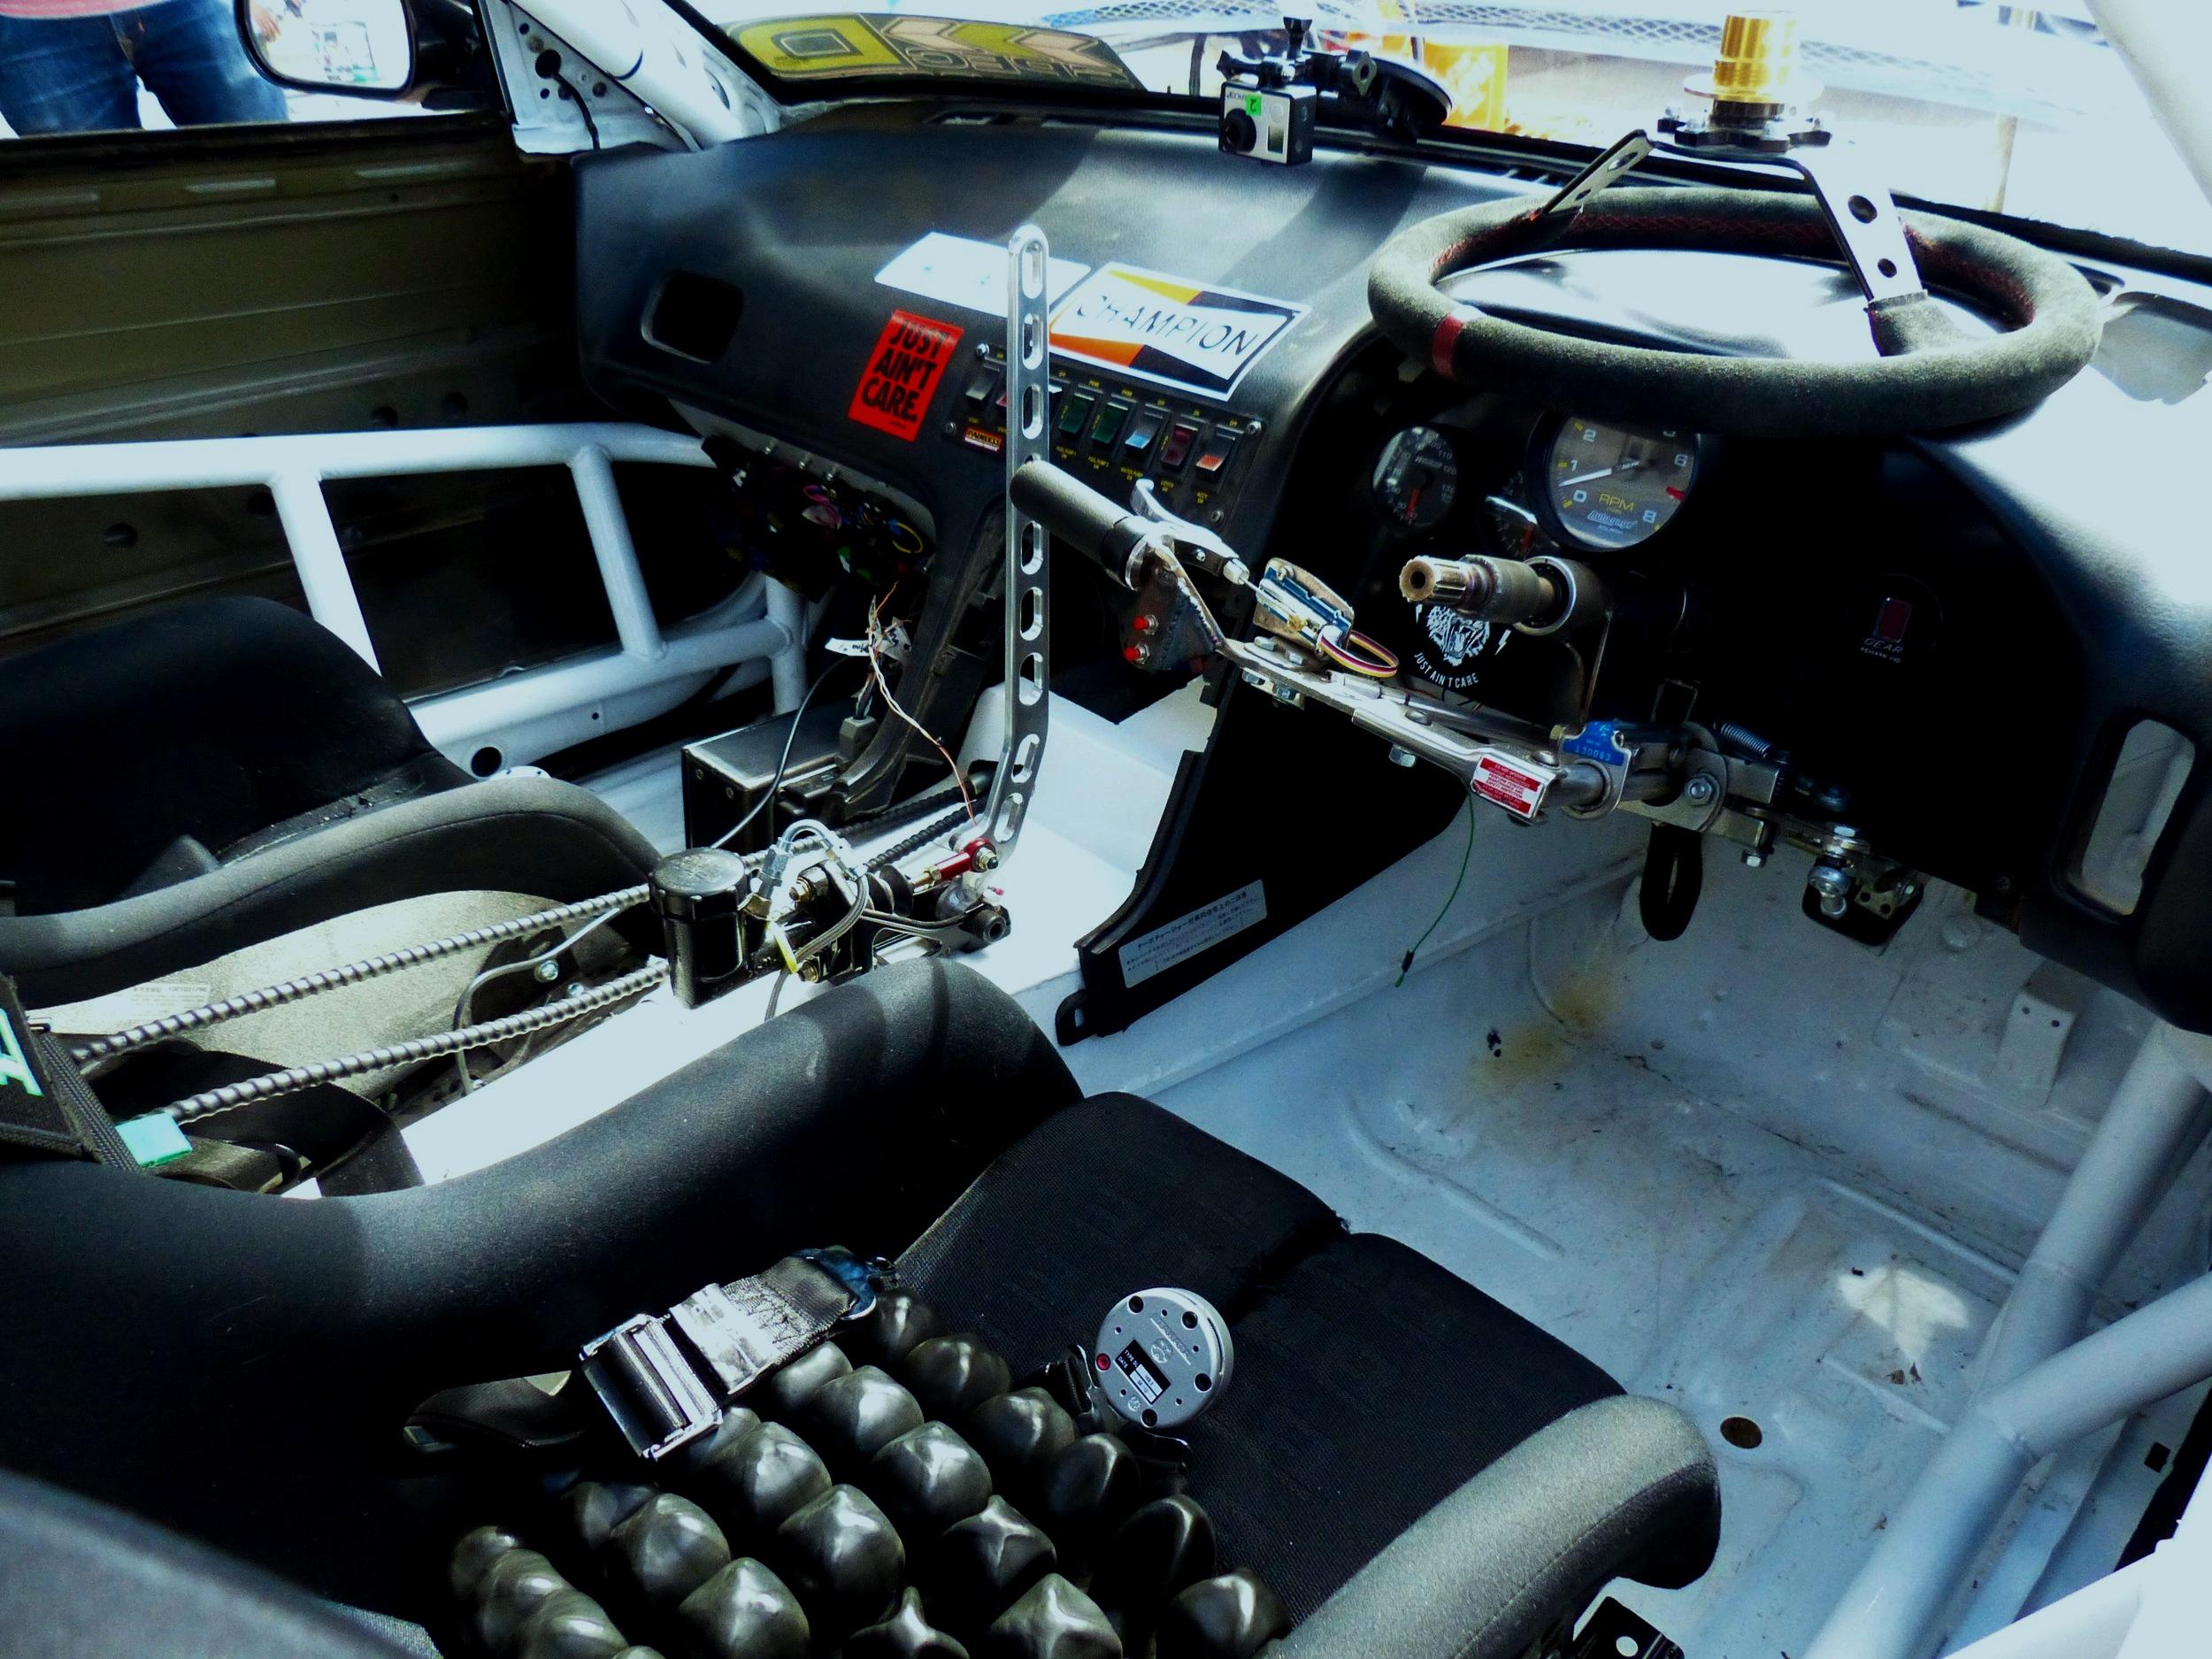 CONTROL SYSTEM - ◘ CS Foundation Custom Hand Control System◘ Racepak Dash◘ Enfield Pneumatic Clutch◘ Enfield Pneumatic Shifter◘ Haltech 2500 Elite ECU◘ Hydraulic Hand Brake [Auto-Disengage Clutch]◘ NRG Steering Wheel